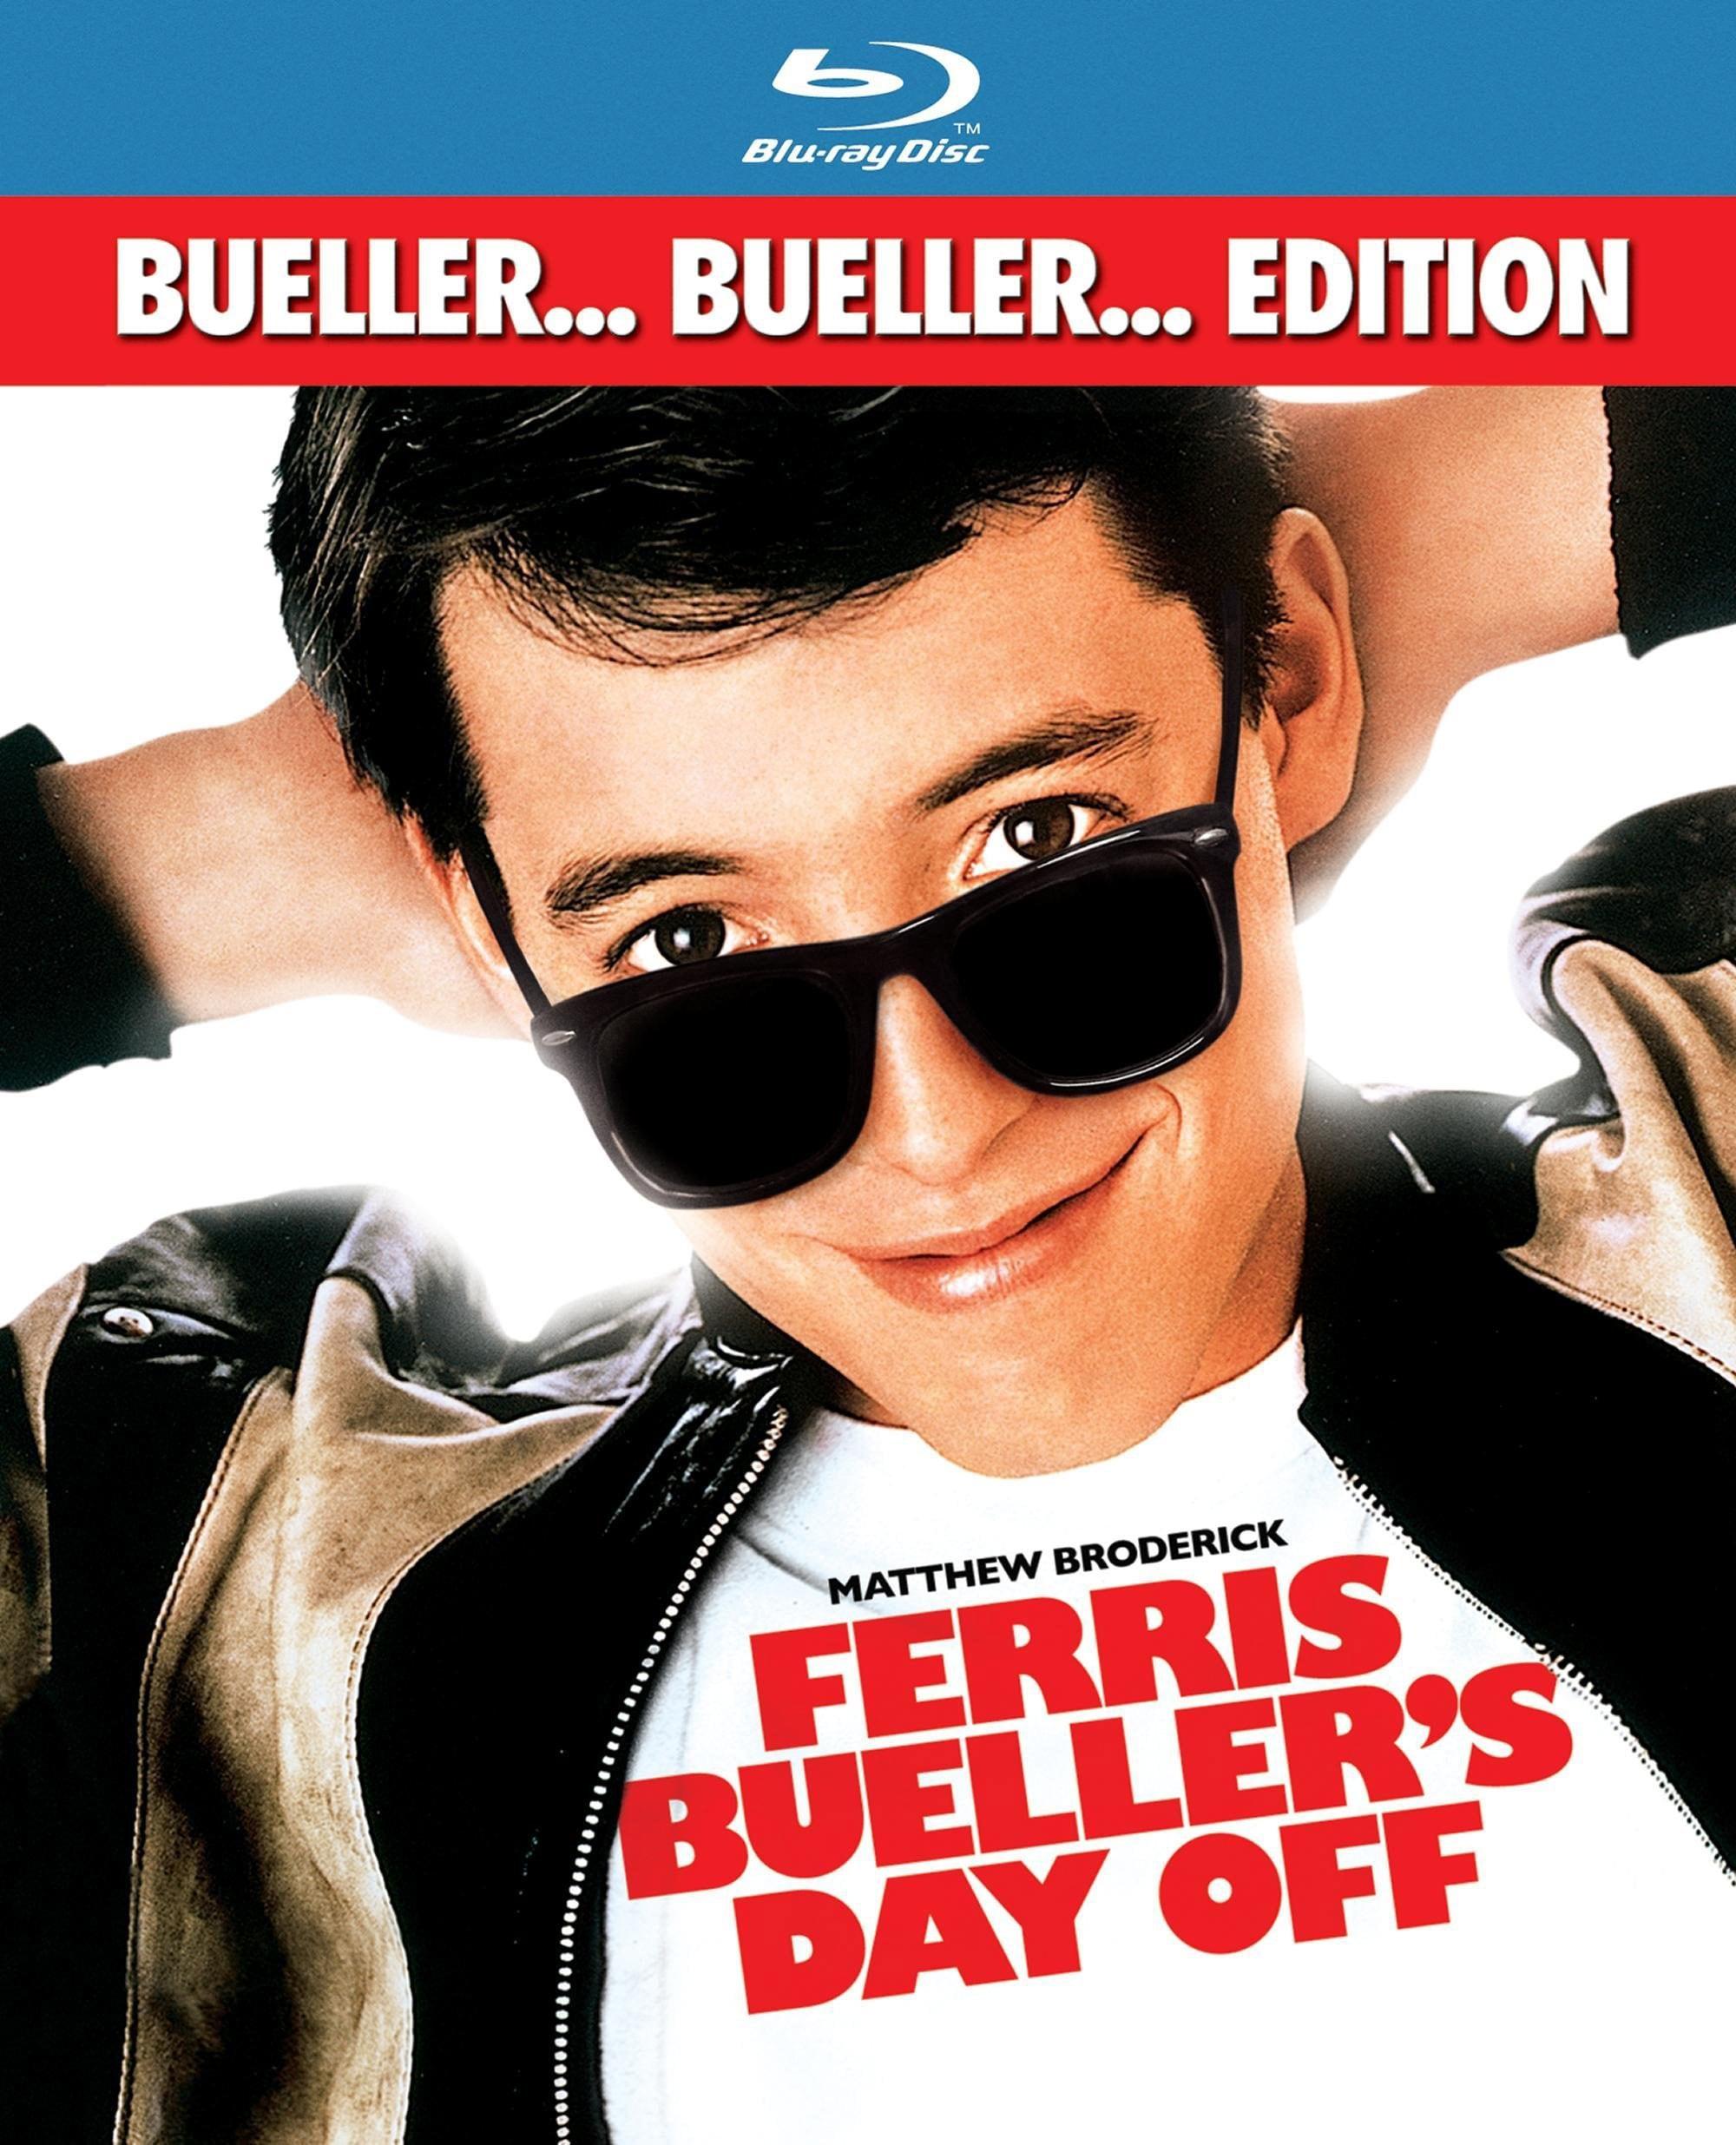 Ferris Bueller's Day Off (Blu-ray Disc)